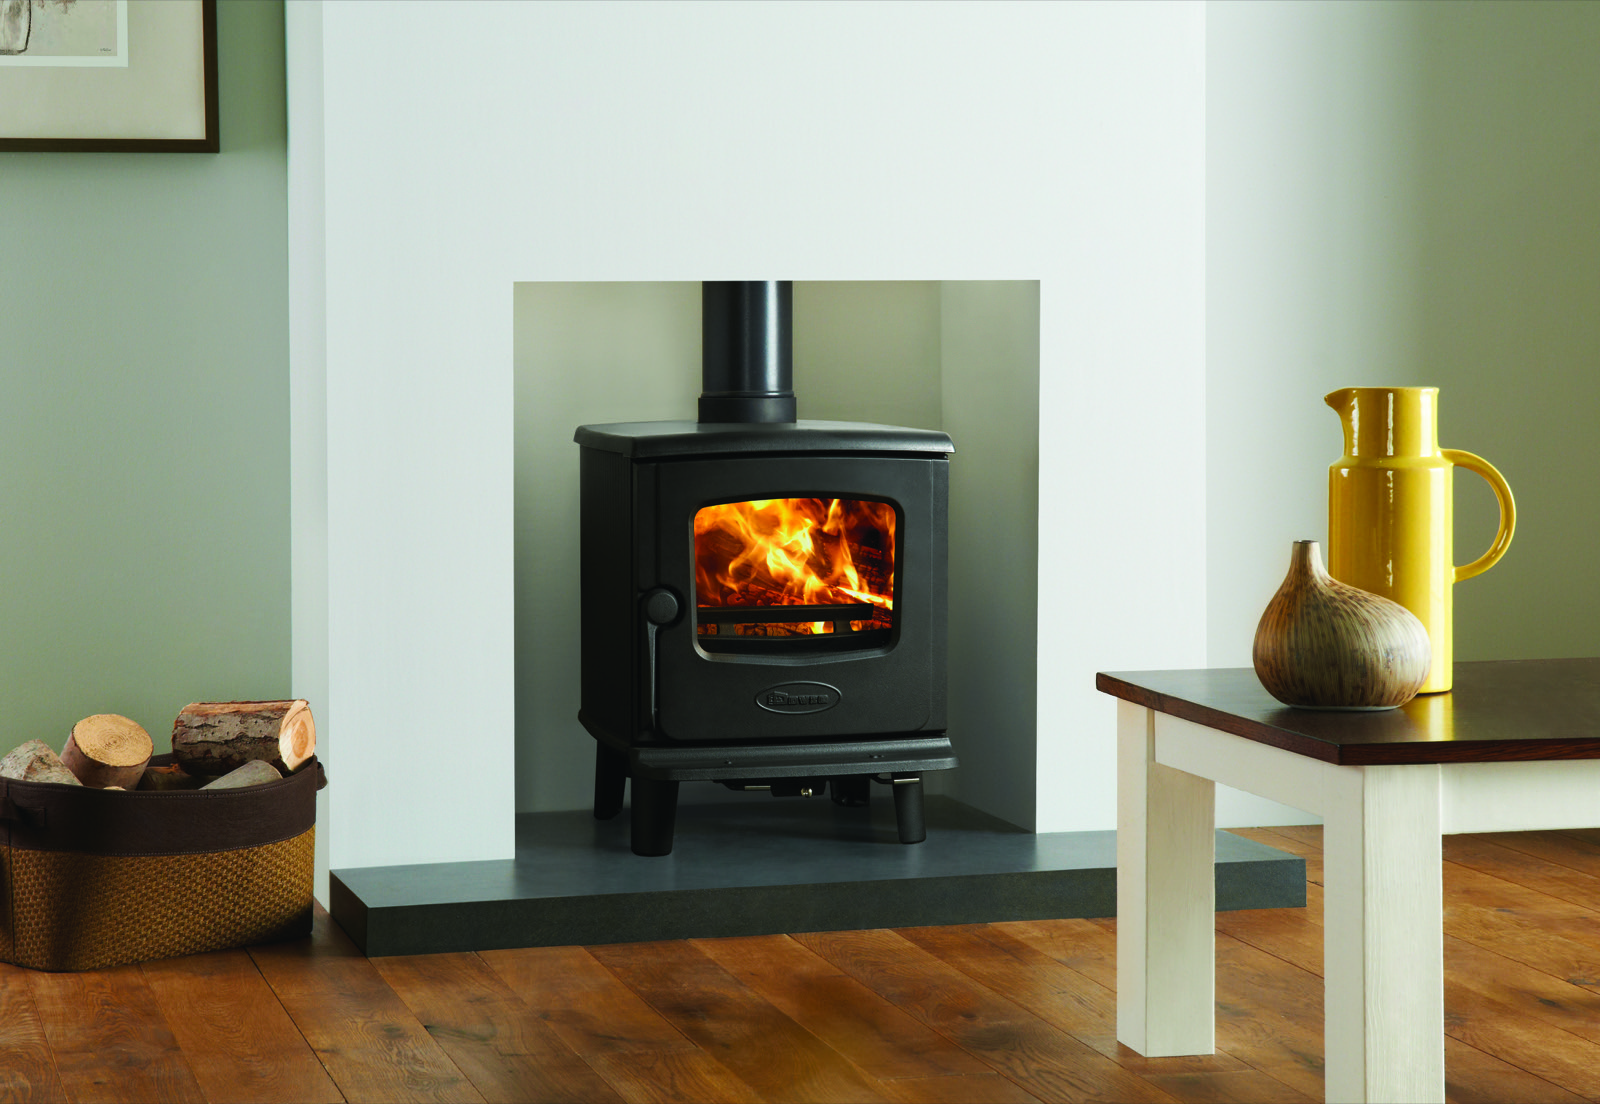 dovre 250mfr multifuel stove simply stoves. Black Bedroom Furniture Sets. Home Design Ideas